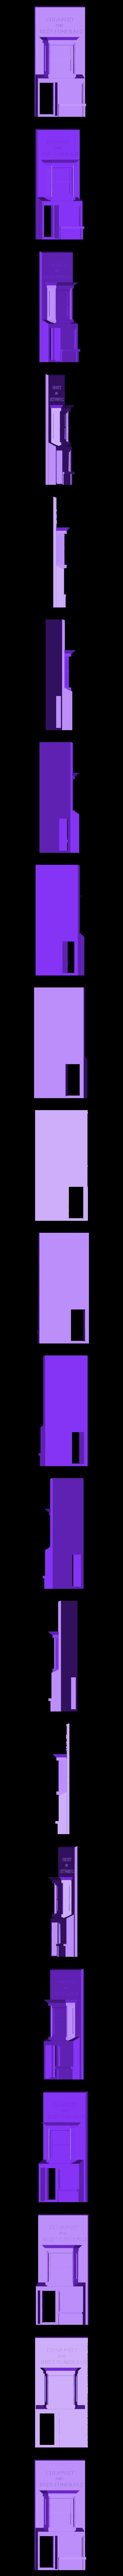 fun_frnt1a_1.stl Download free STL file Ripper's London - Funeral Parlour / Shop • 3D print template, Earsling